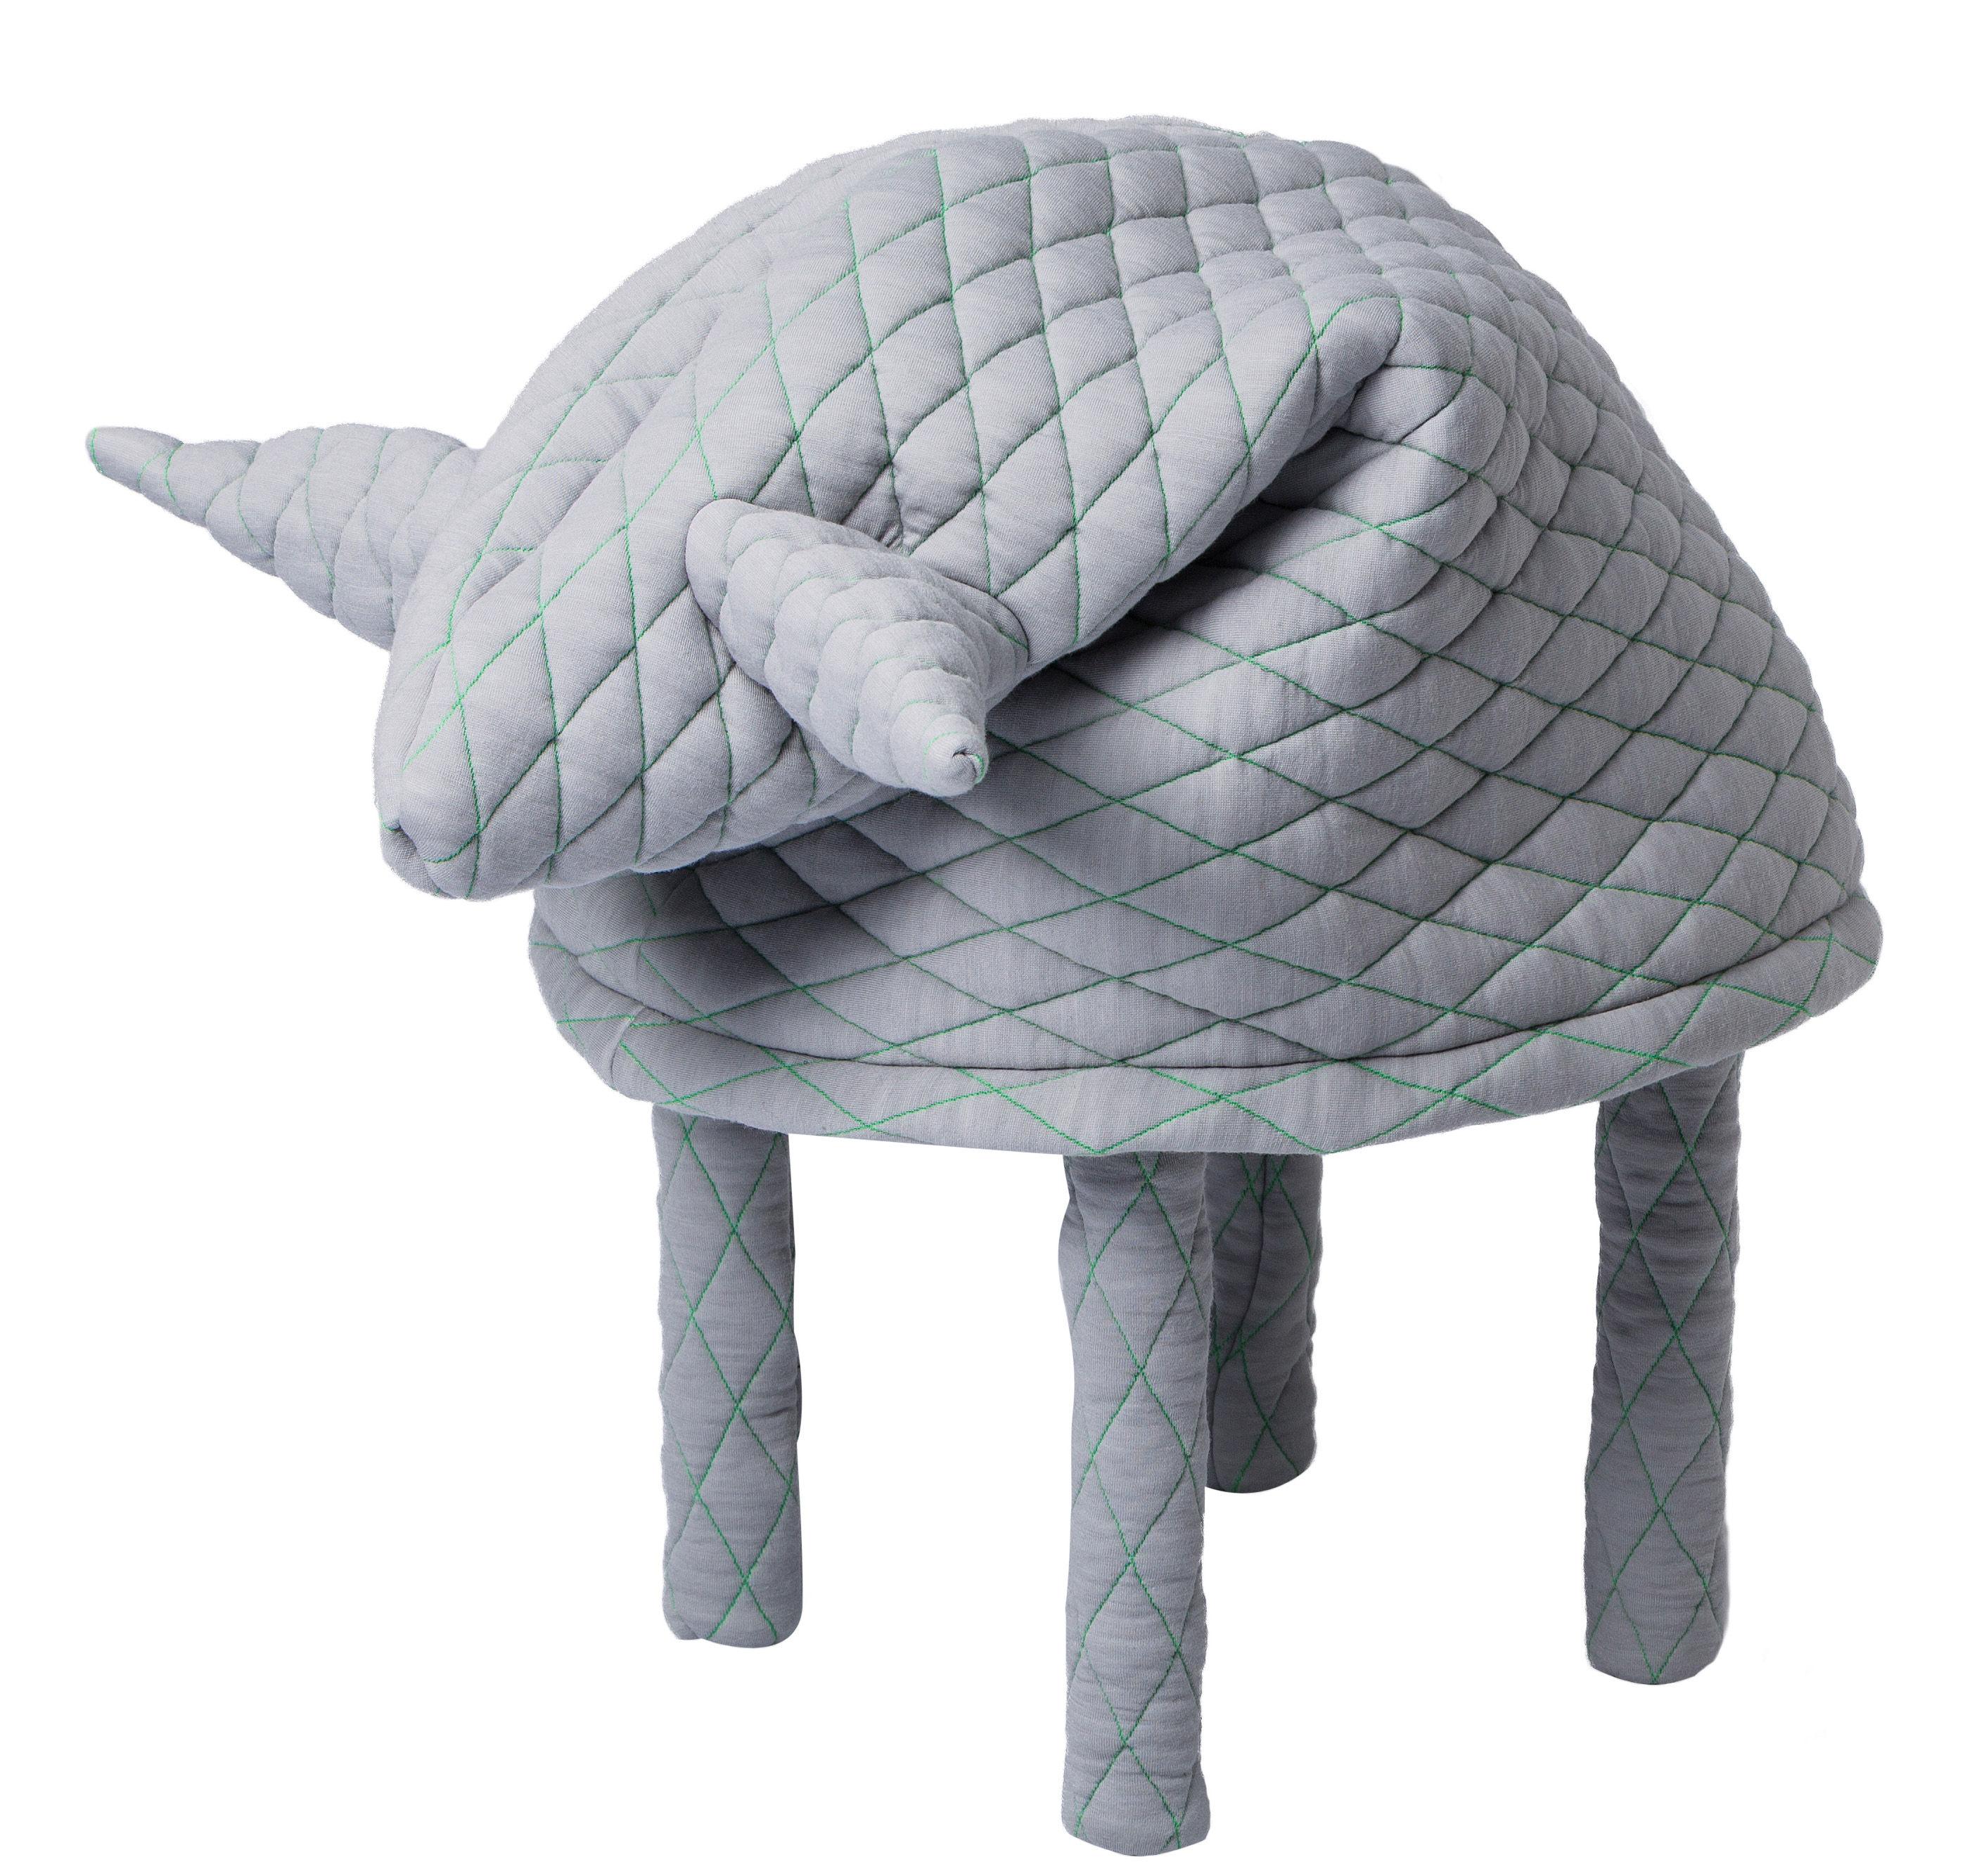 Möbel - Möbel für Kinder - Petstools Fin / Mouton Hocker Hocker - Petite Friture - Schaf / hellgrau - Gewebe, Holz, Polyesterfaser